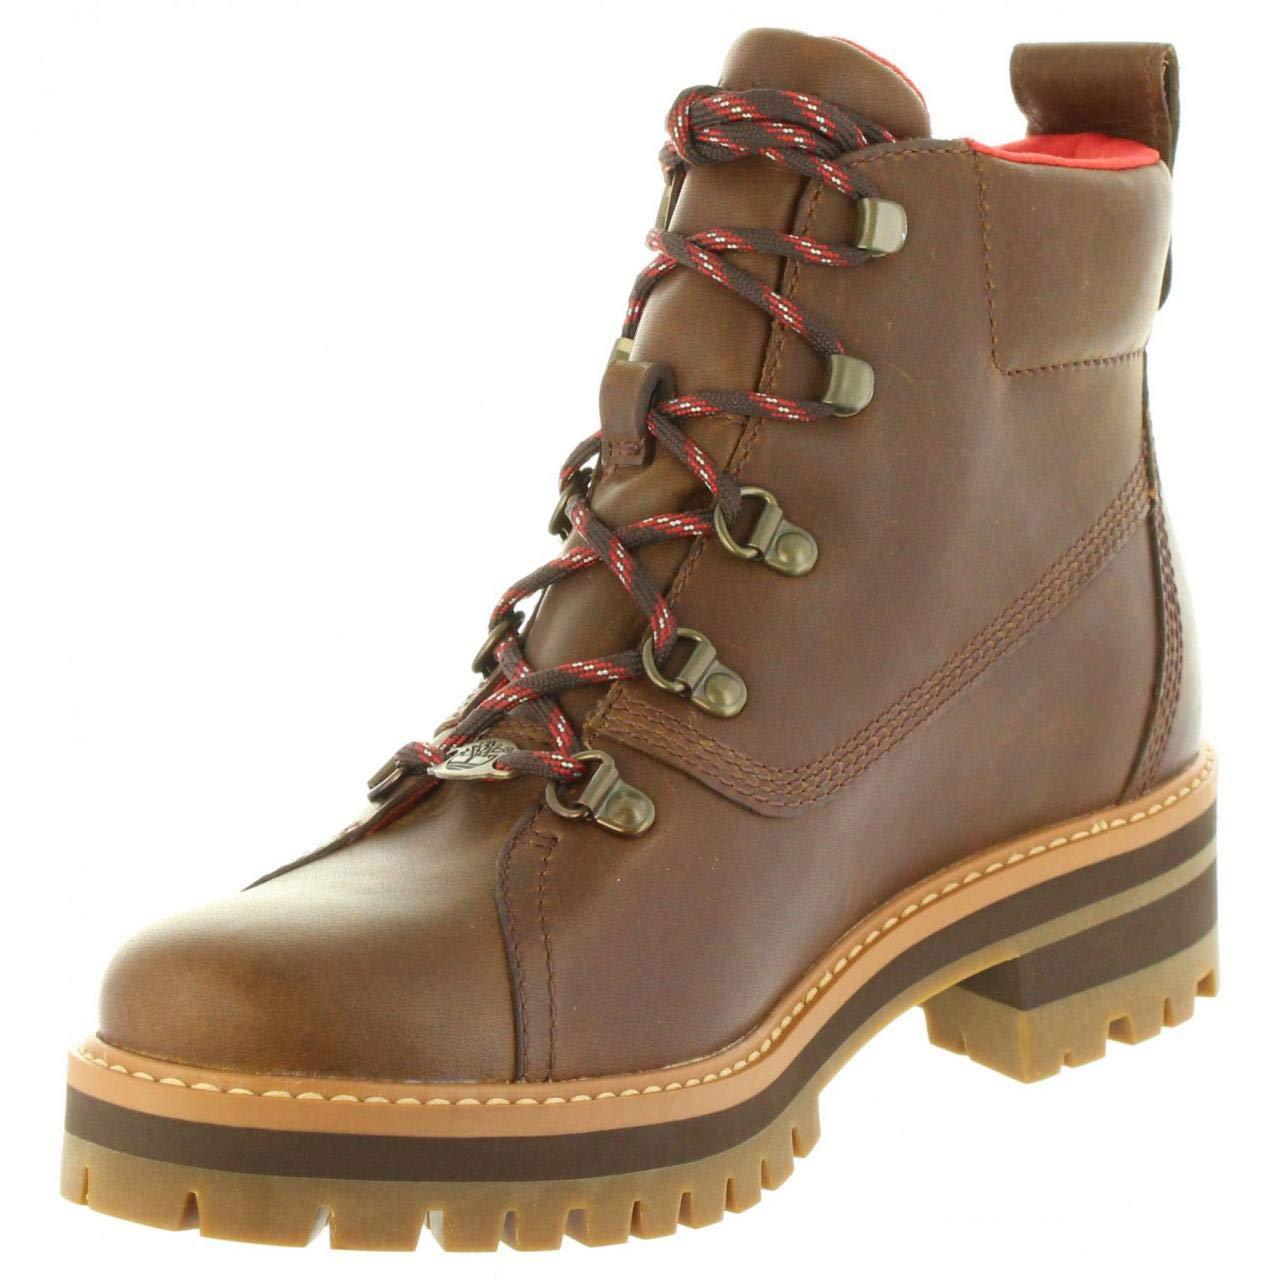 Timberland Stiefel für Damen A1RS7 COURMAYEUR Dark Brown Schuhgröße 37   Amazon.de  Schuhe   Handtaschen b9ee1e8657